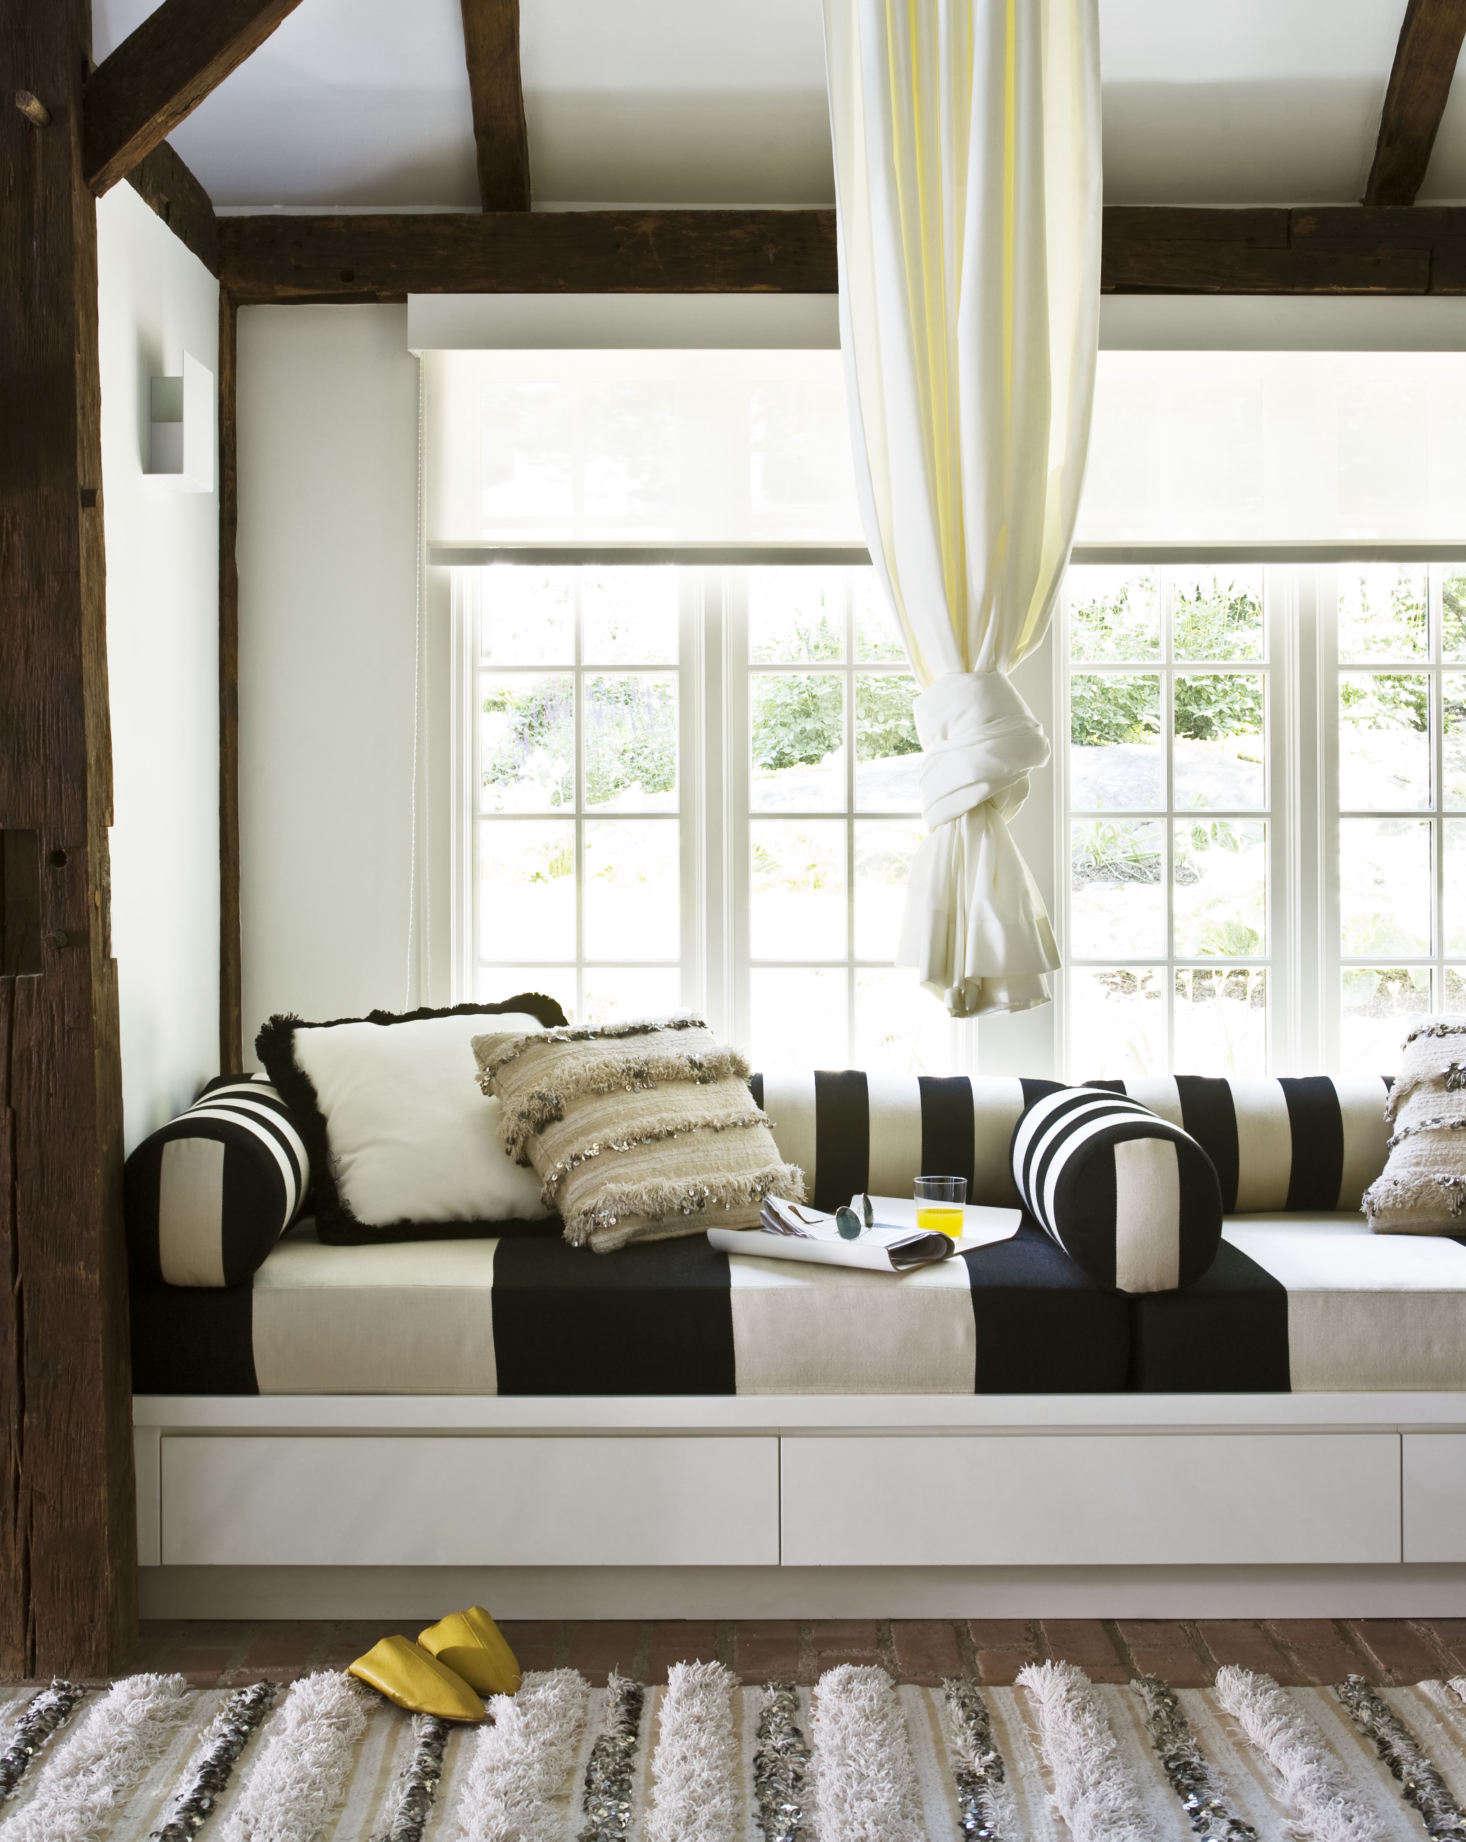 alexandra loew interiors poolhouse9